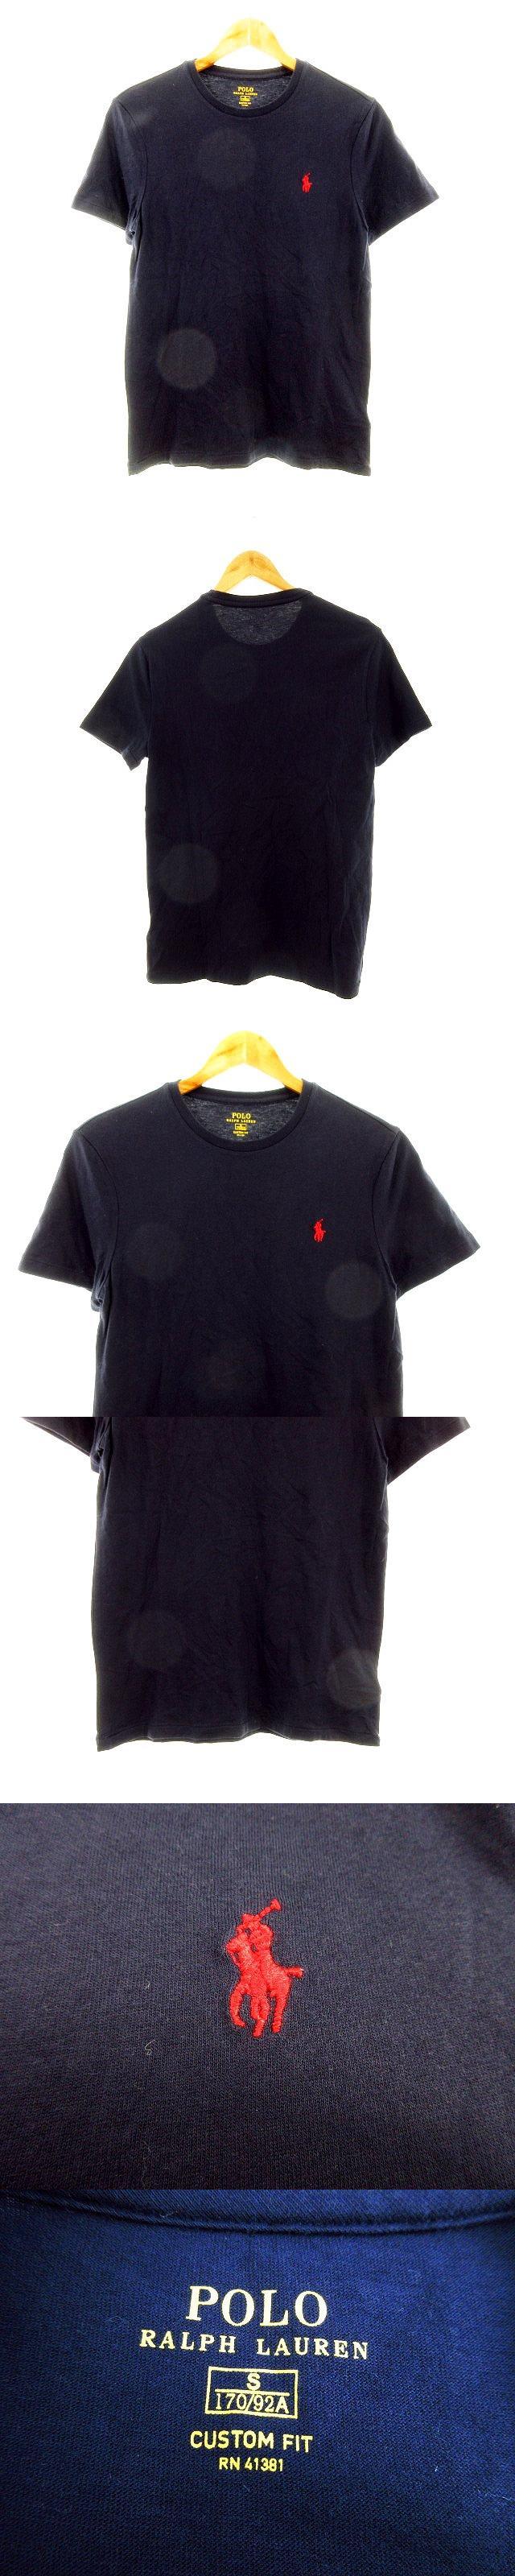 Tシャツ カットソー 半袖 ロゴ S 紺 ネイビー /M2